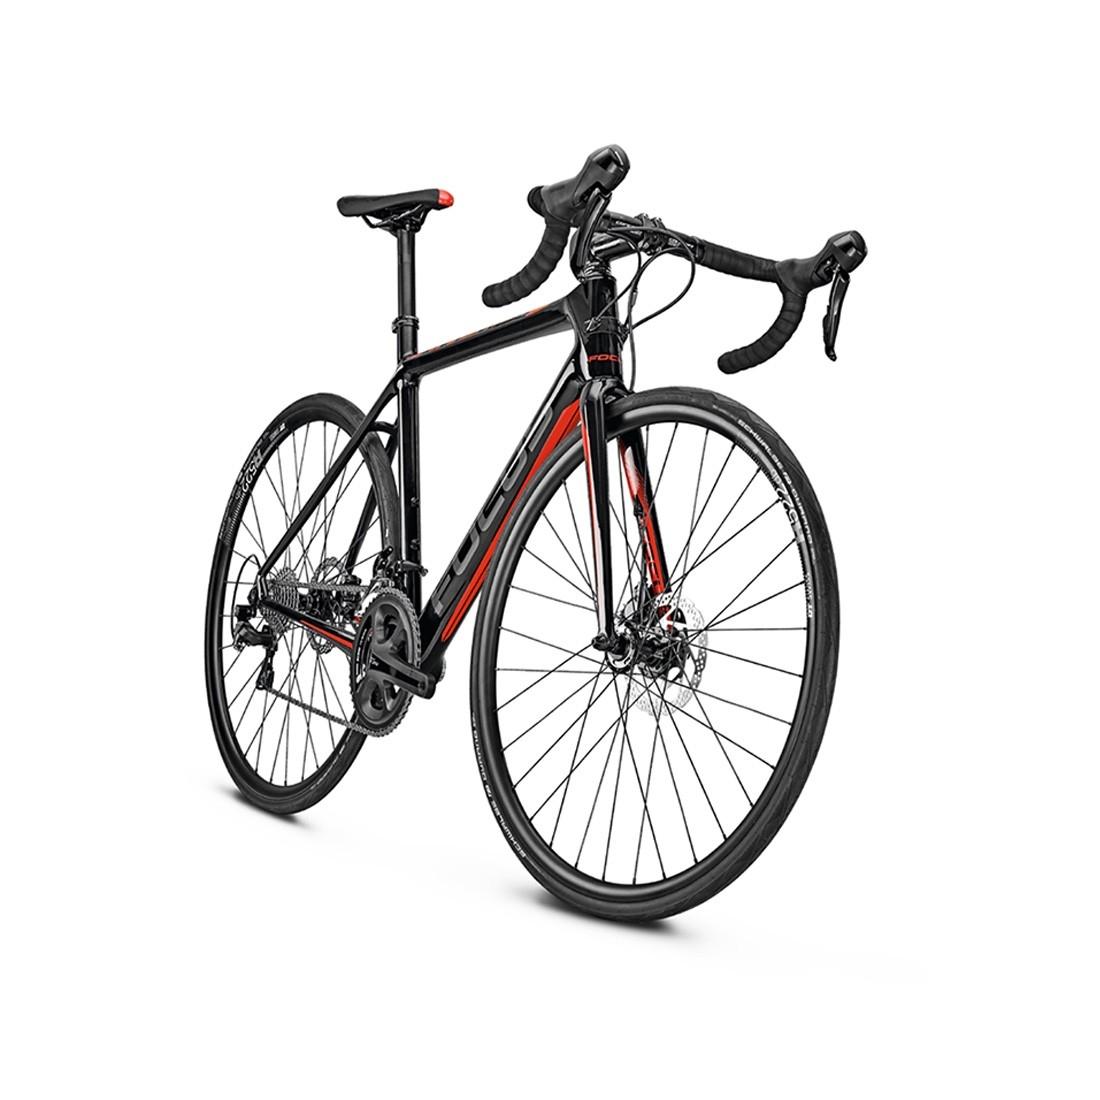 34d13c888b4 FOCUS Cayo Disc 2017 Carbon / Red / Grey Road bike · Motocard